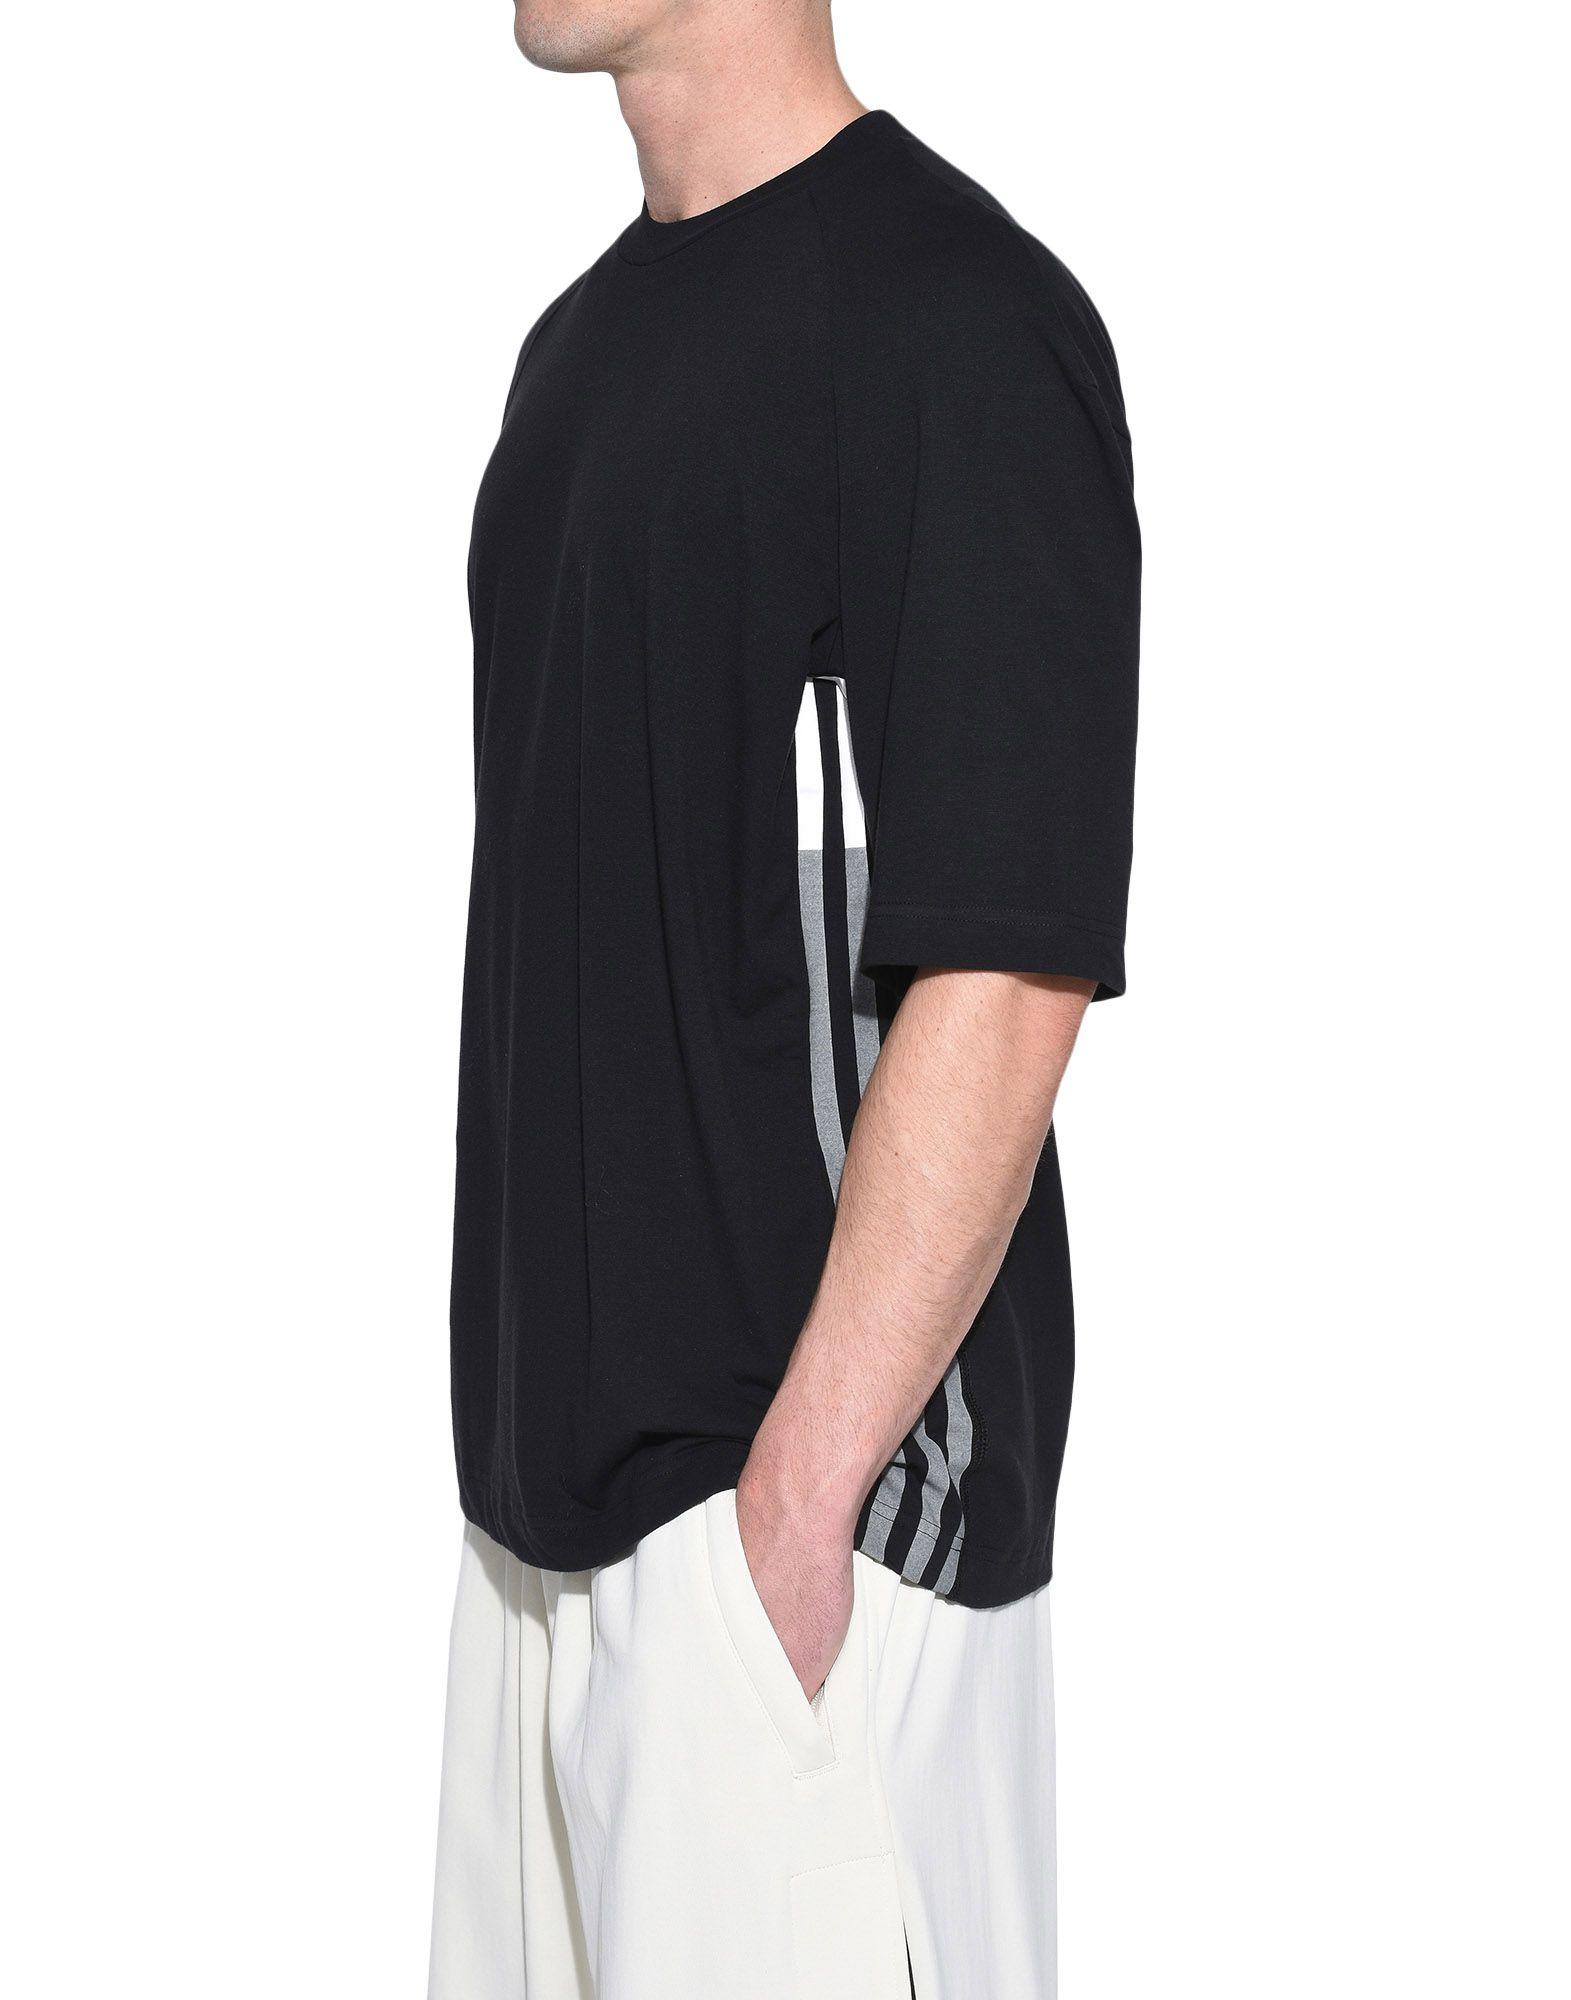 Y-3 Y-3 3-Stripes Tee Short sleeve t-shirt Man e